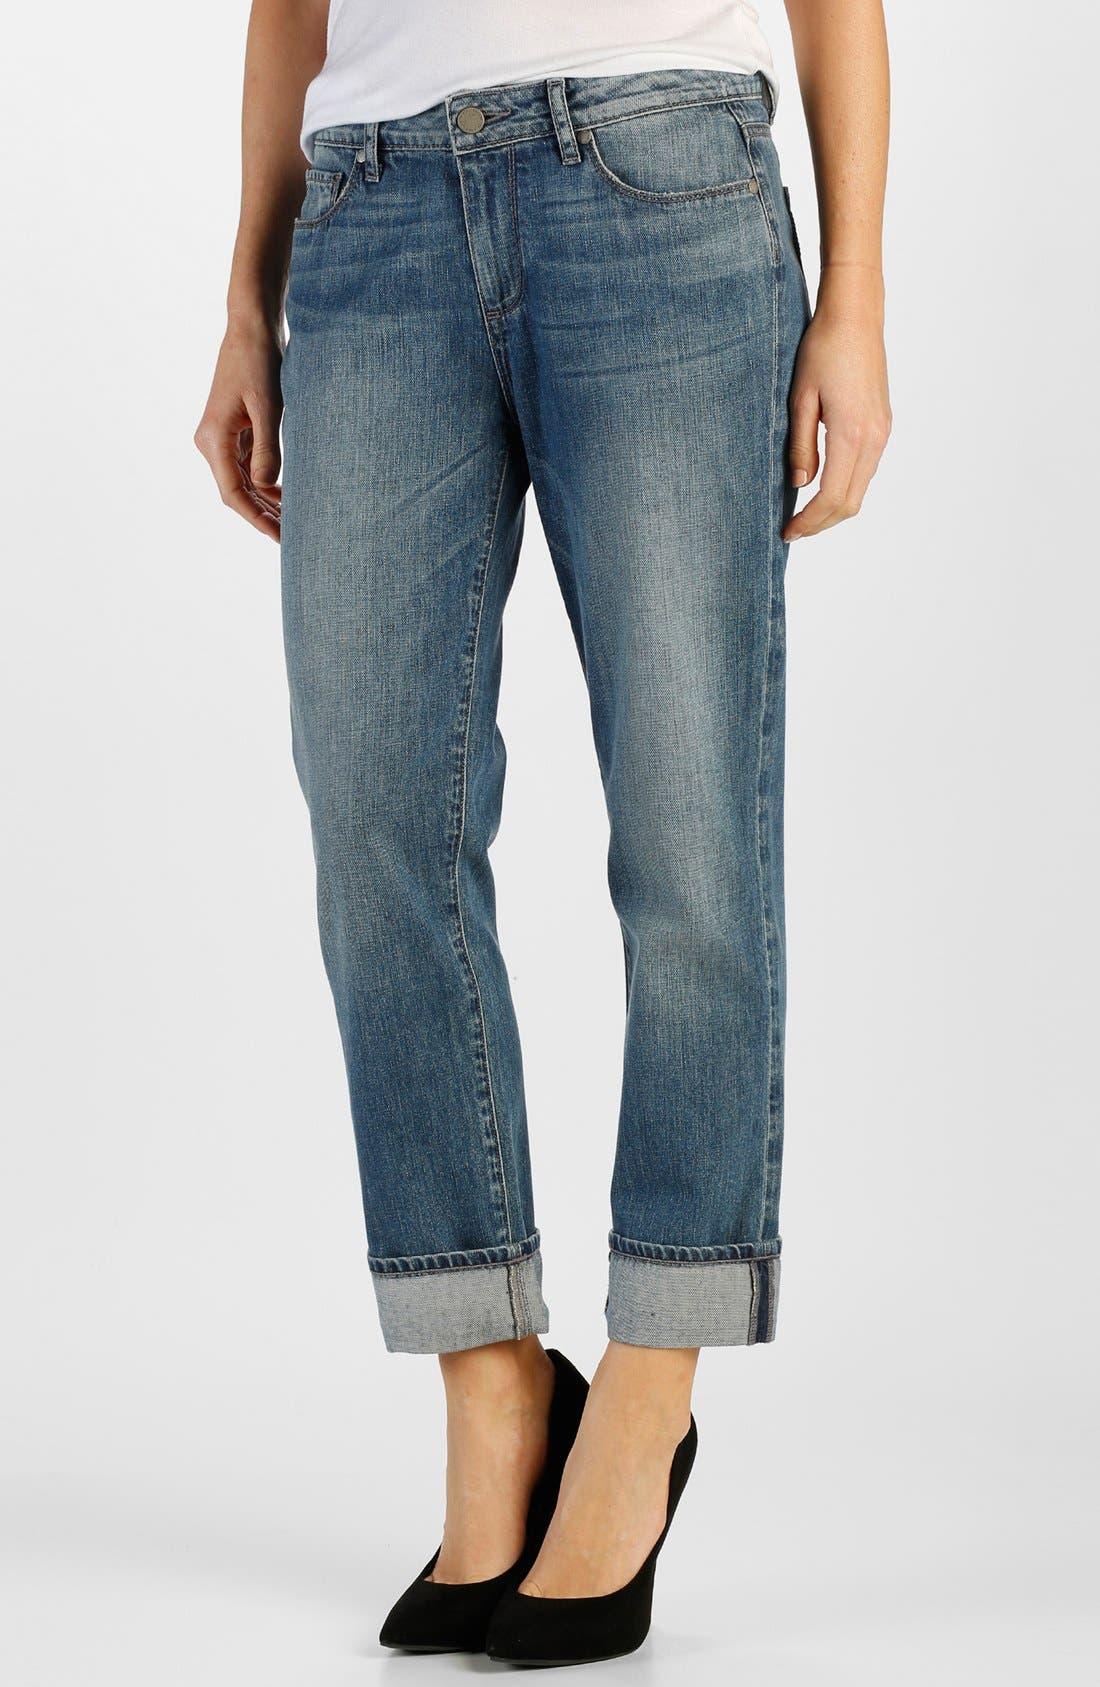 Alternate Image 1 Selected - Paige Denim 'Porter' Boyfriend Jeans (Dazeley)